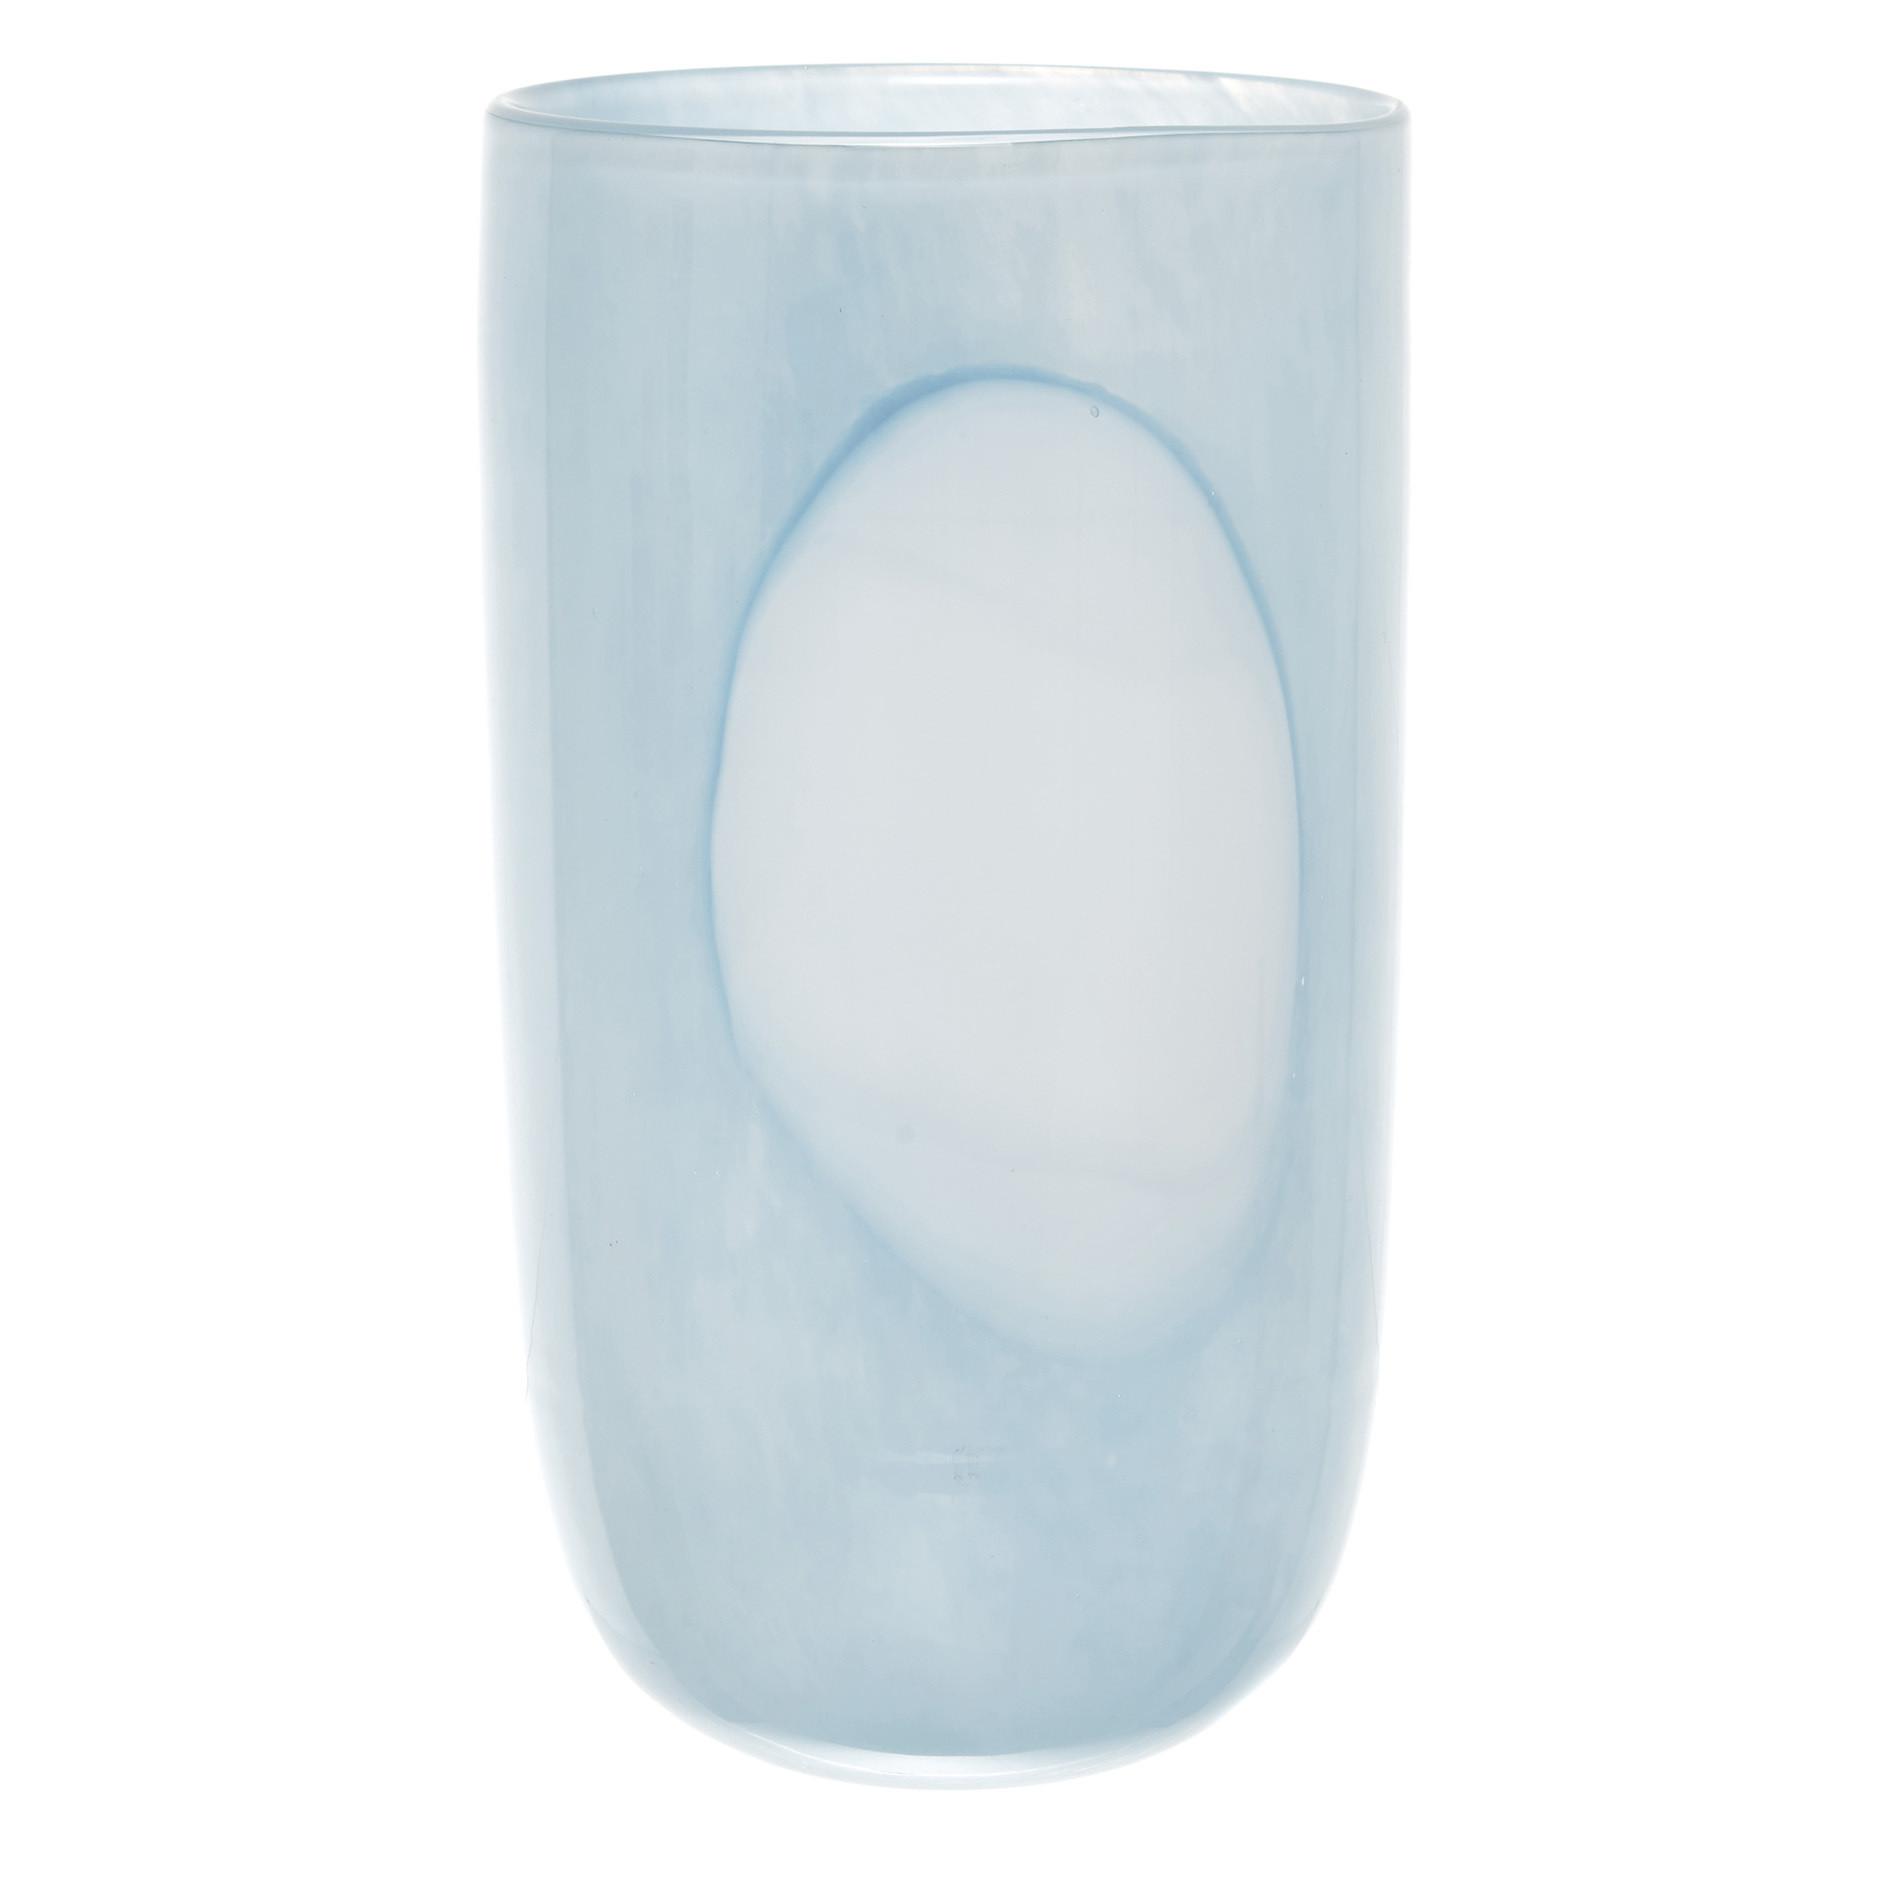 Vaso vetro colorato in pasta cerchio, Azzurro, large image number 0